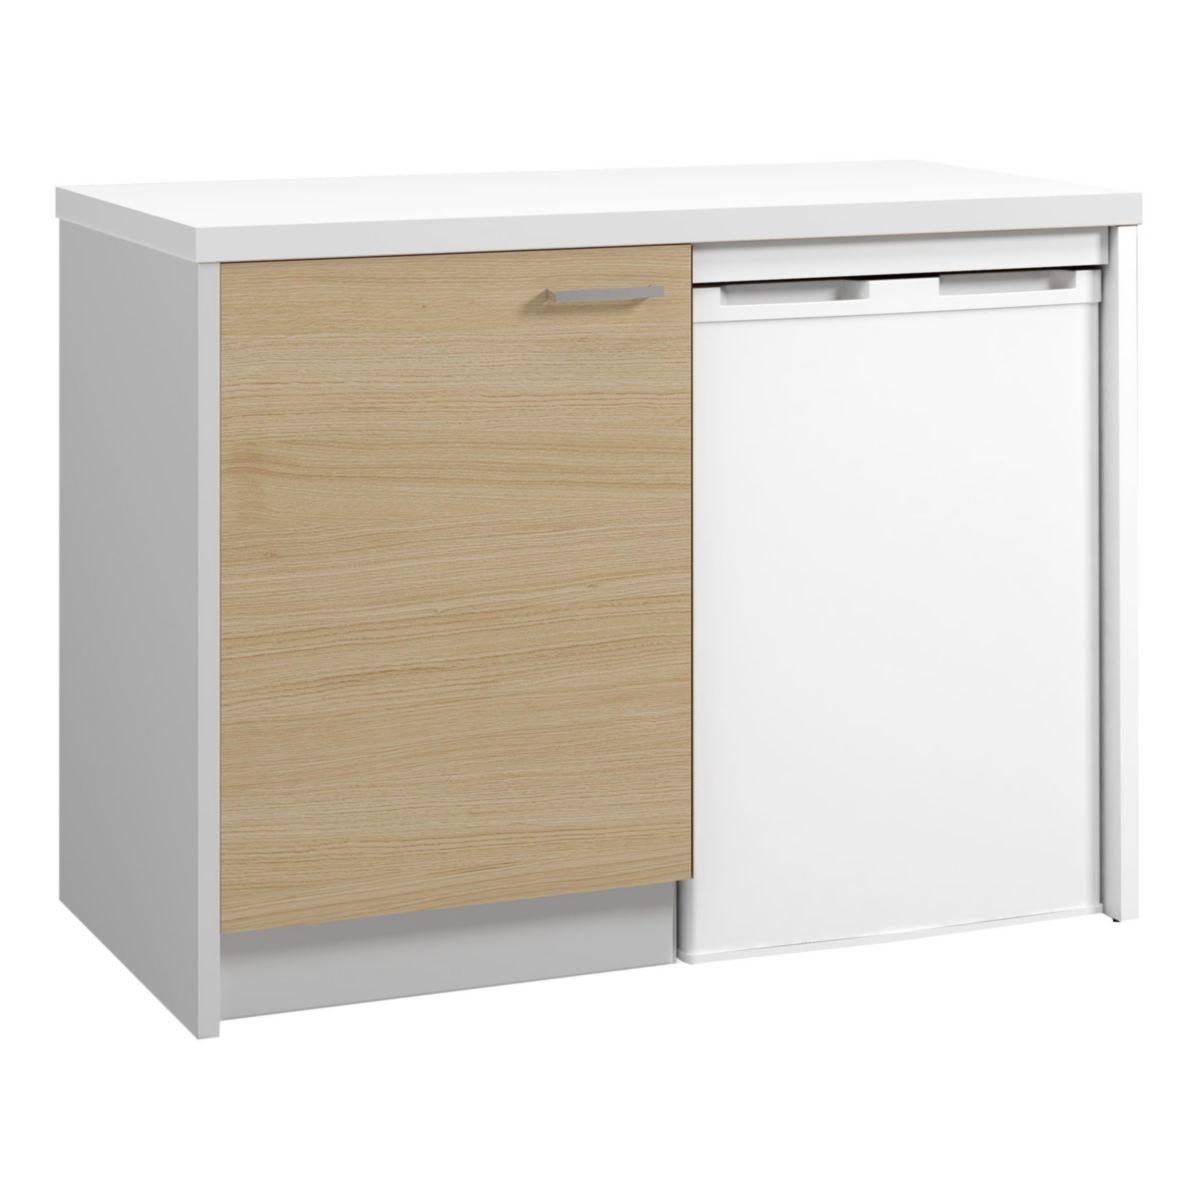 meuble bas 1 porte onelia colori chene en 60 cm rf abop060d11 moderna sanitaire cedeo